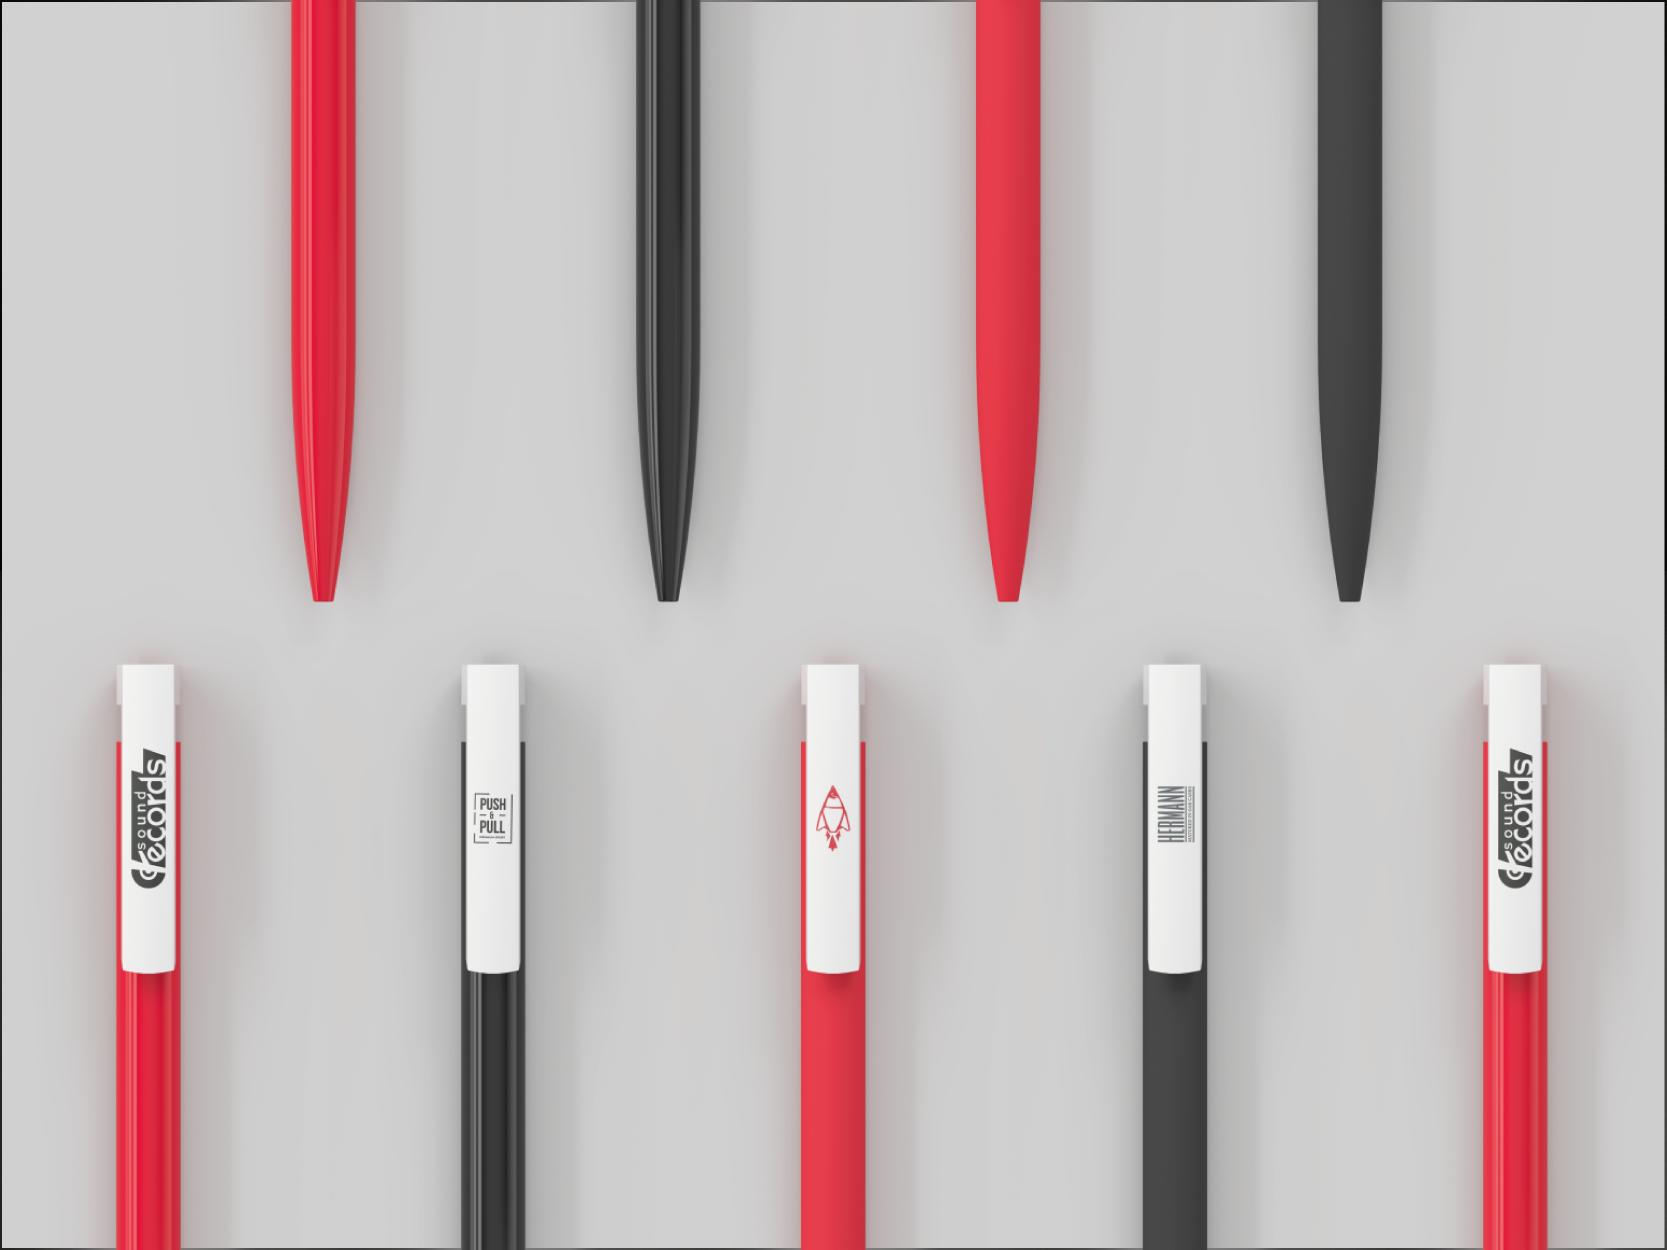 Pen collection v2 01